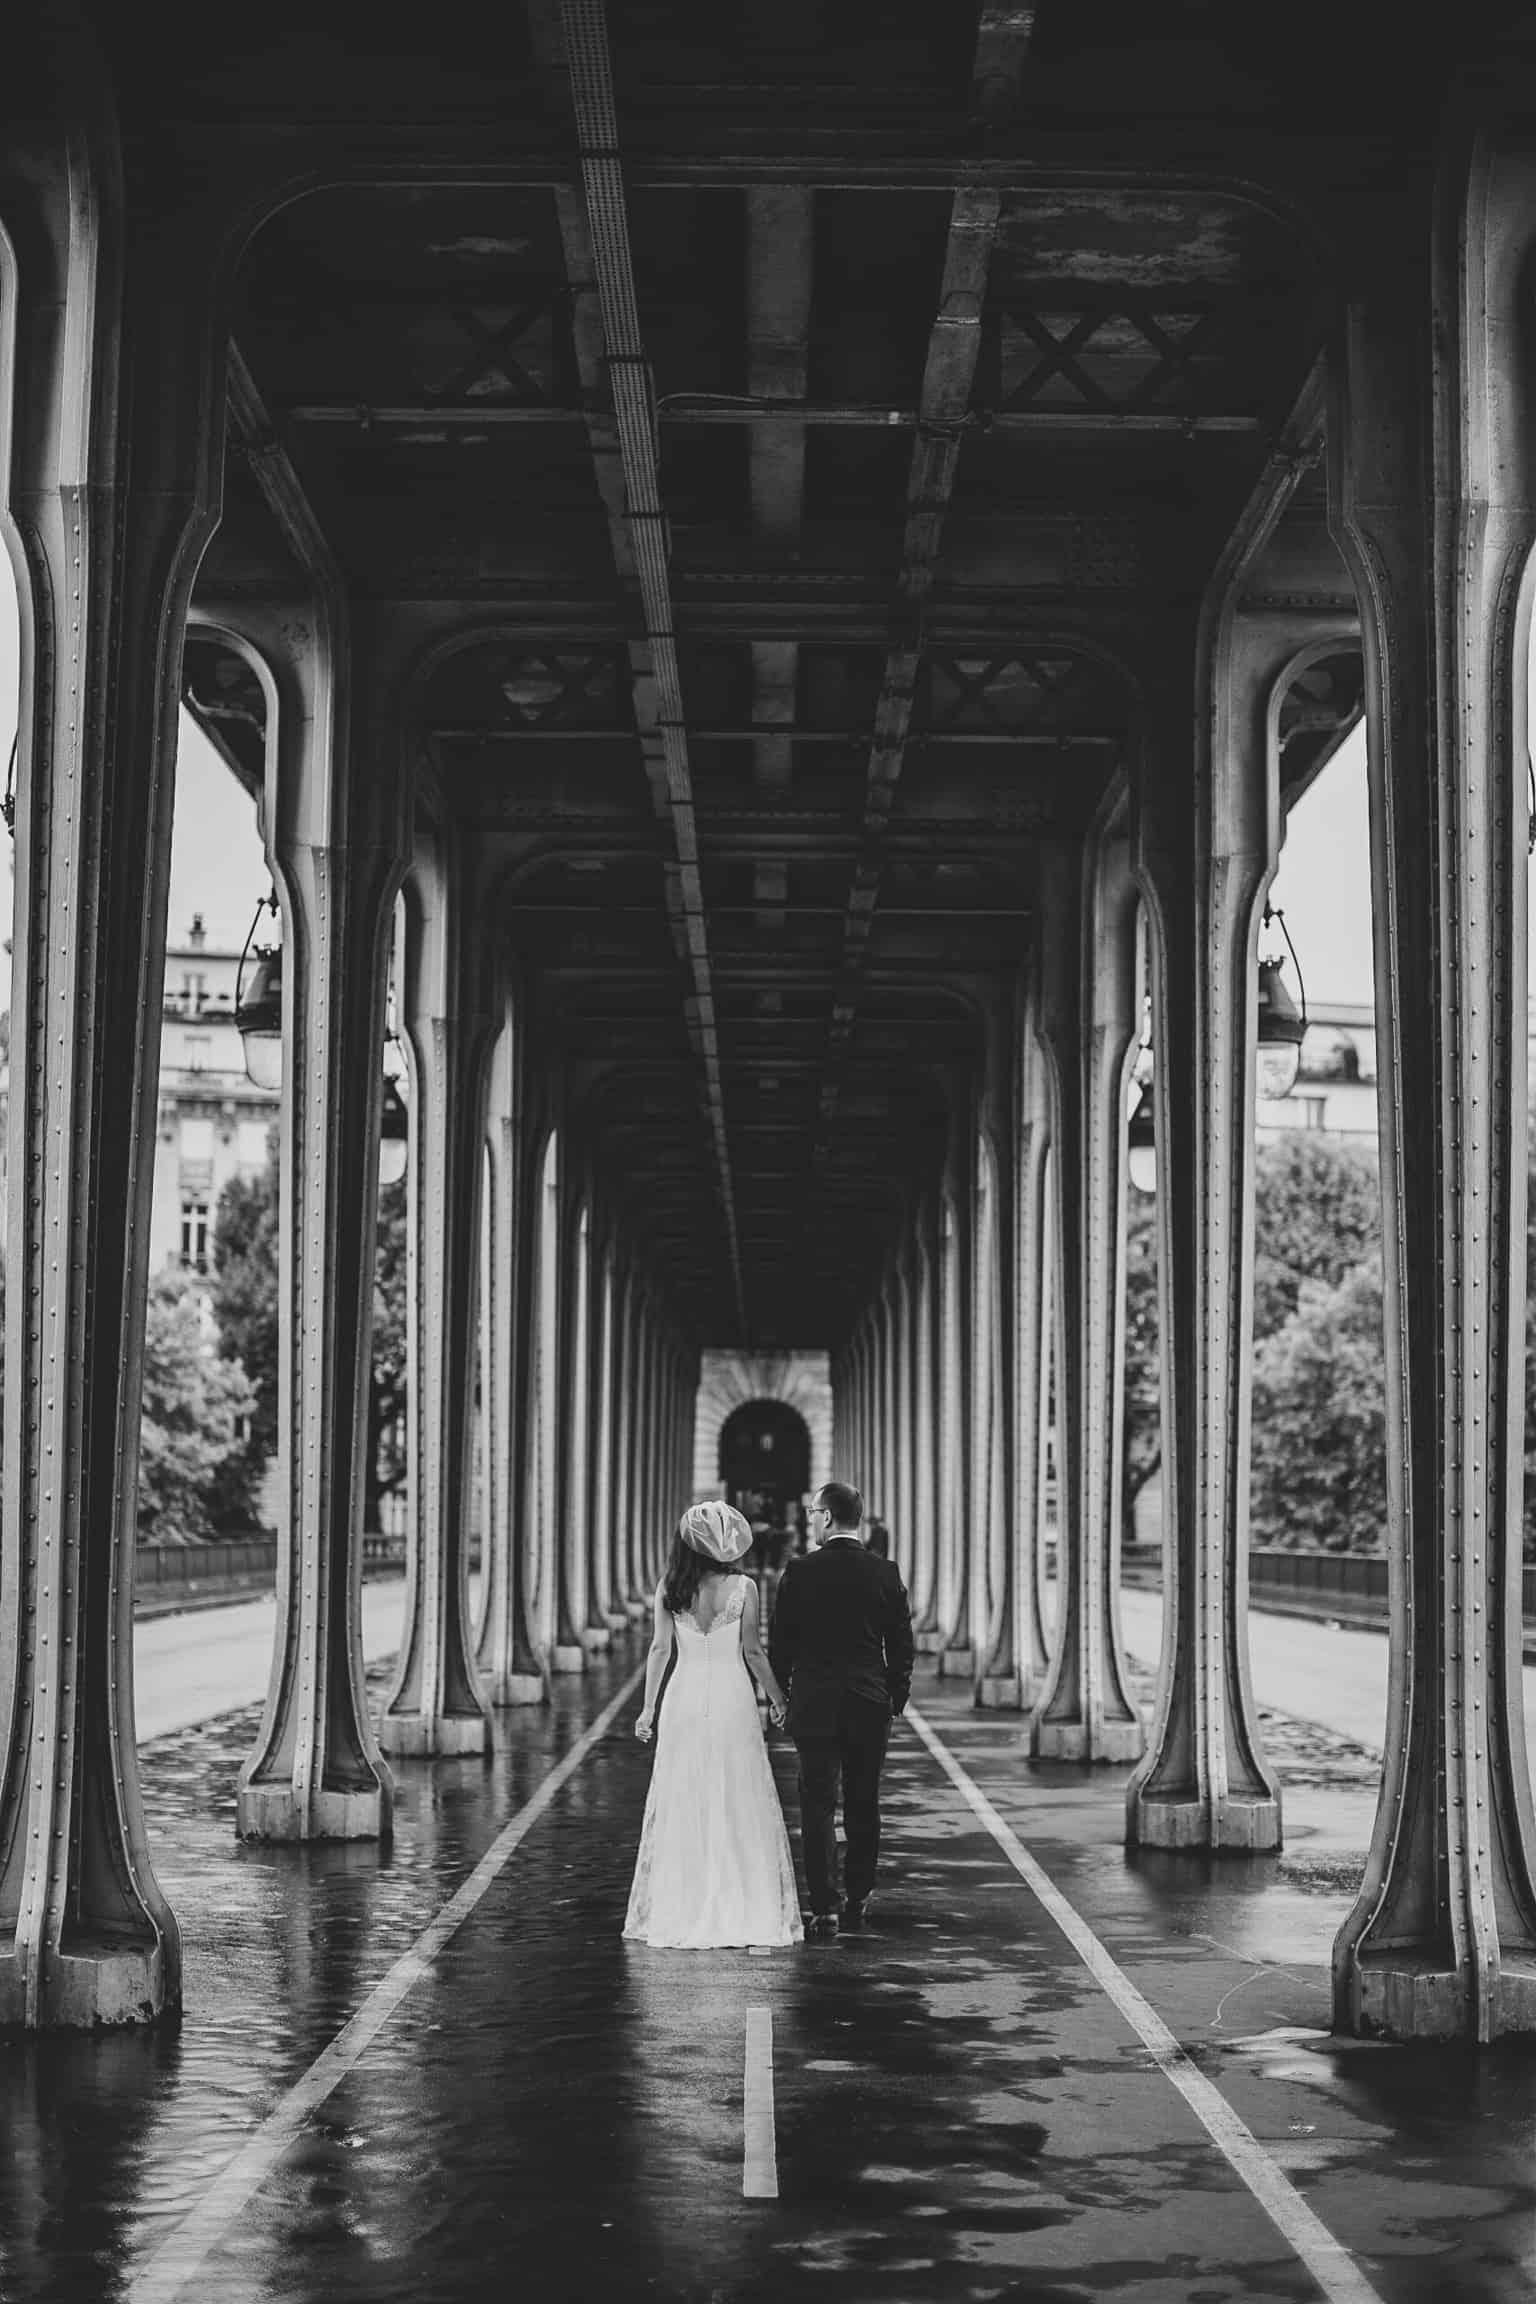 Sacramento San Francisco Paris Wedding Photographer-Wedding in Paris-Turkish Wedding-2015